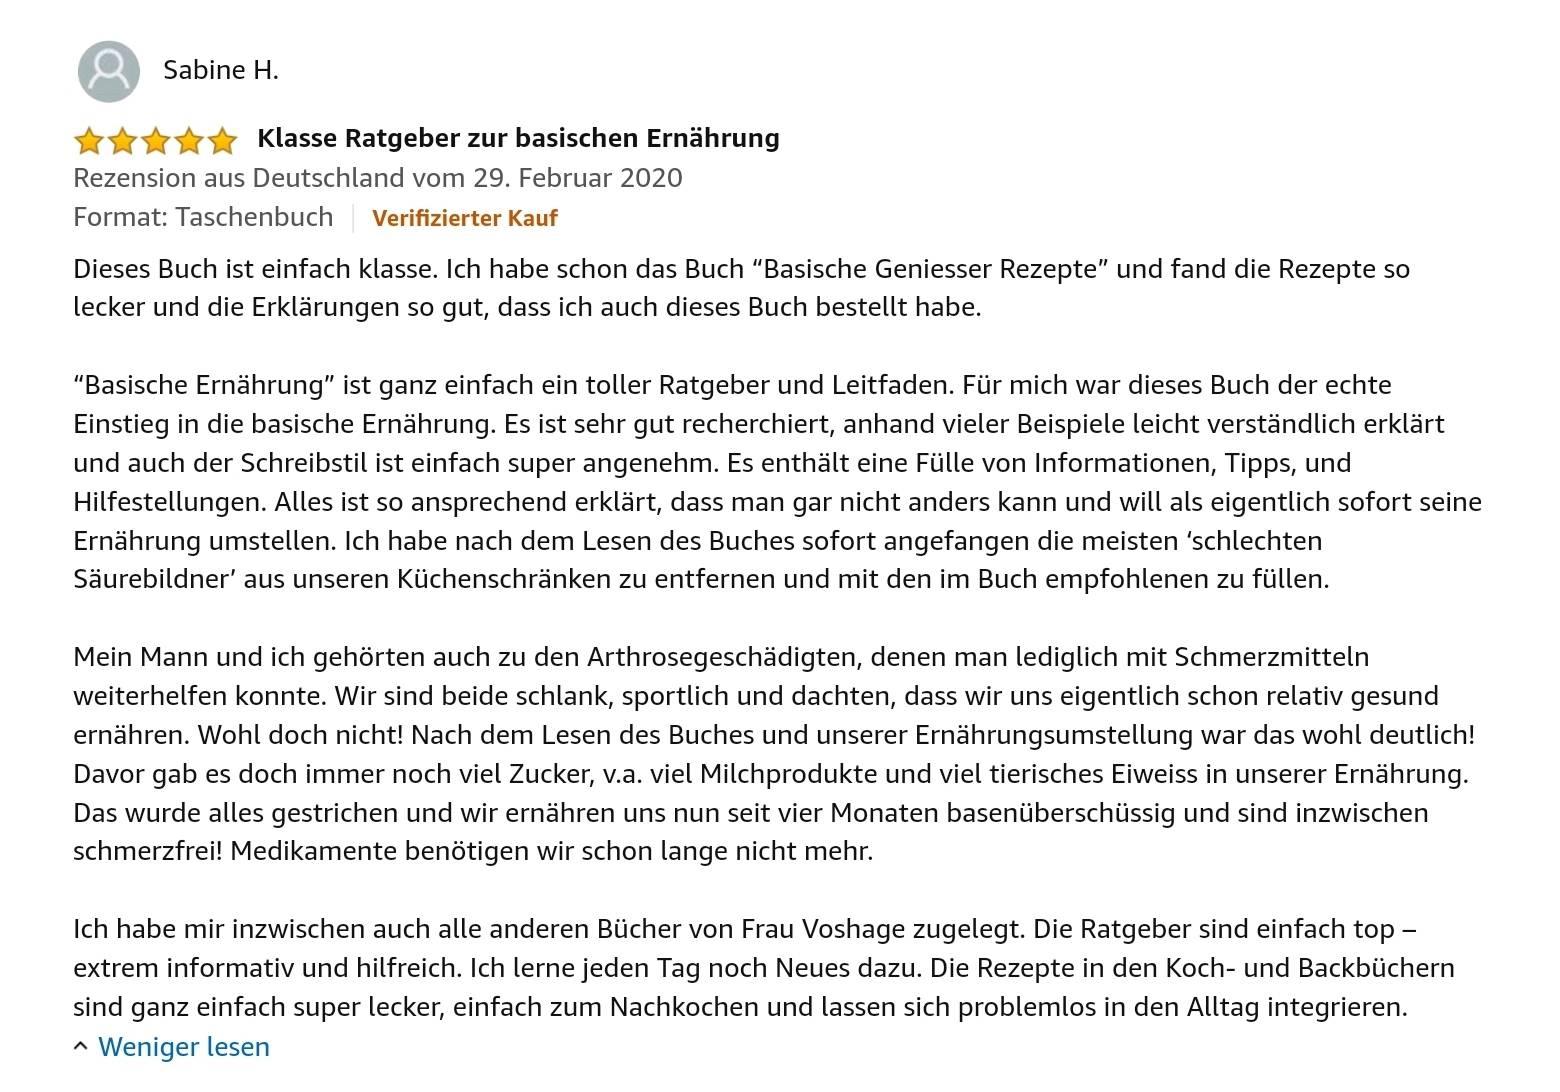 Kundenbewertung Amazon